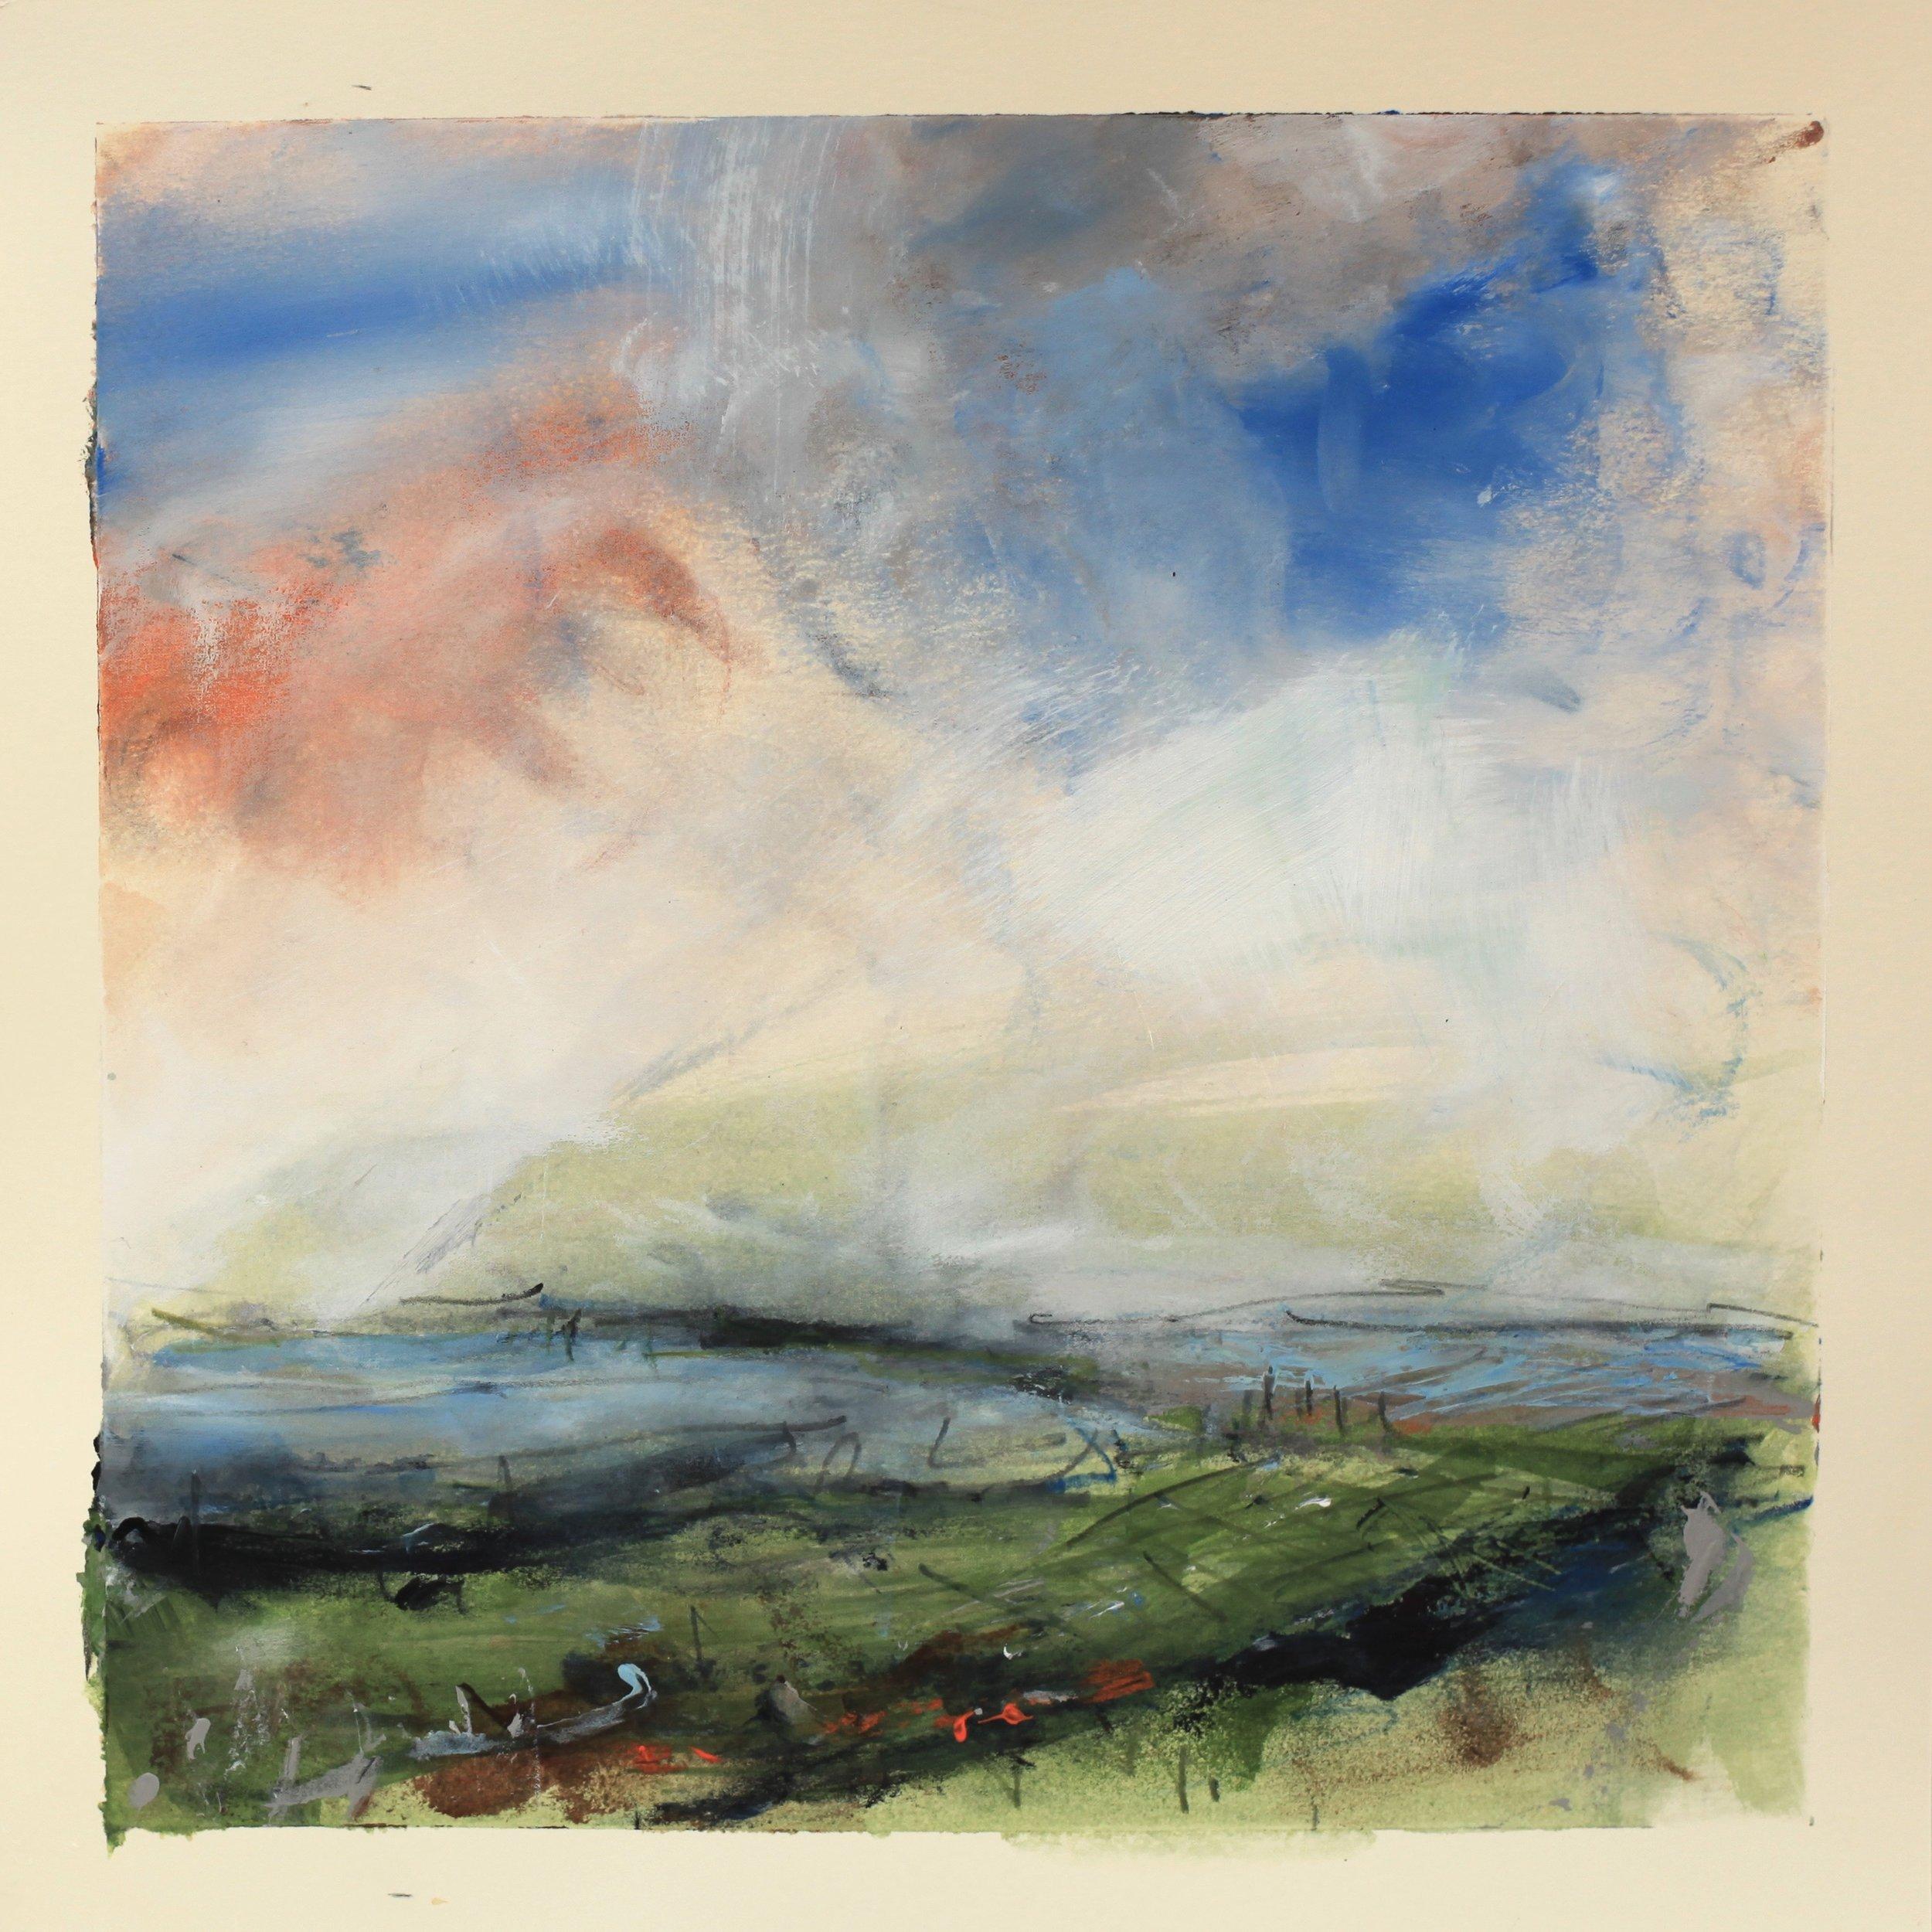 The view across, watercolour, 28 x 28cm